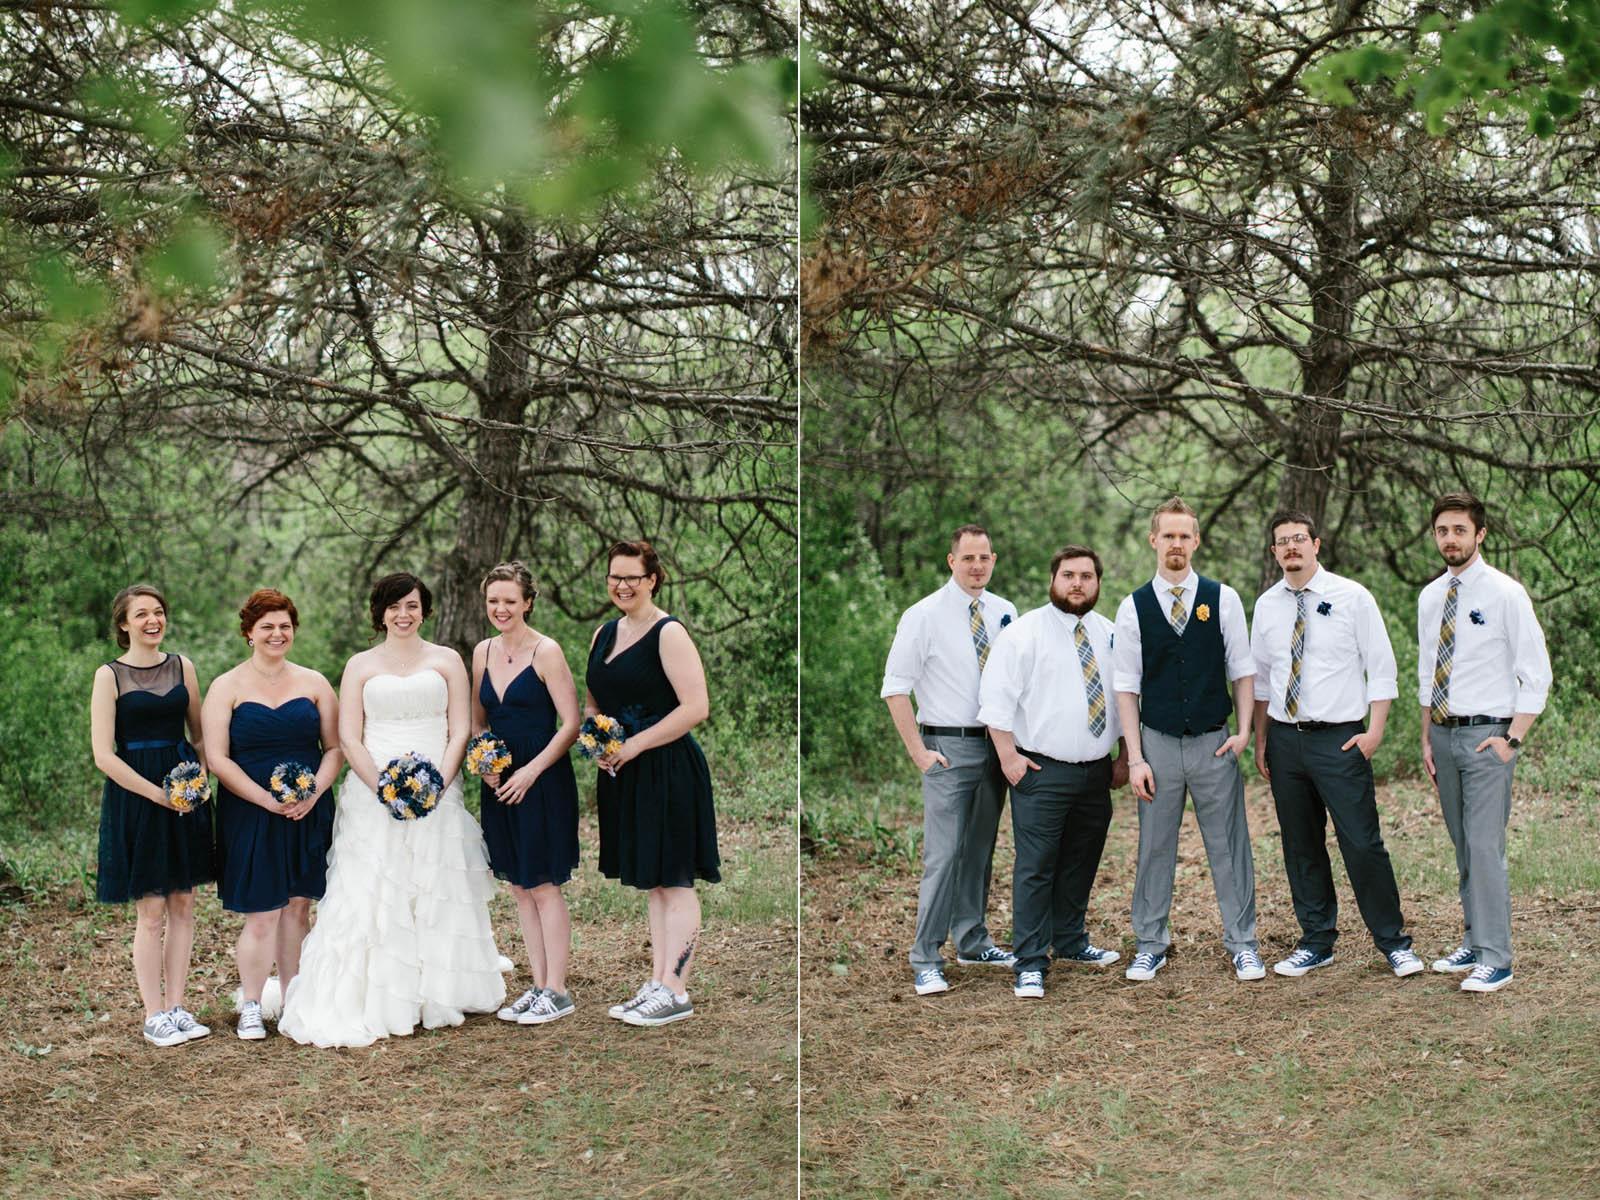 DesMoines_Wedding_Photographer_Spencer&Amanda_035.jpg